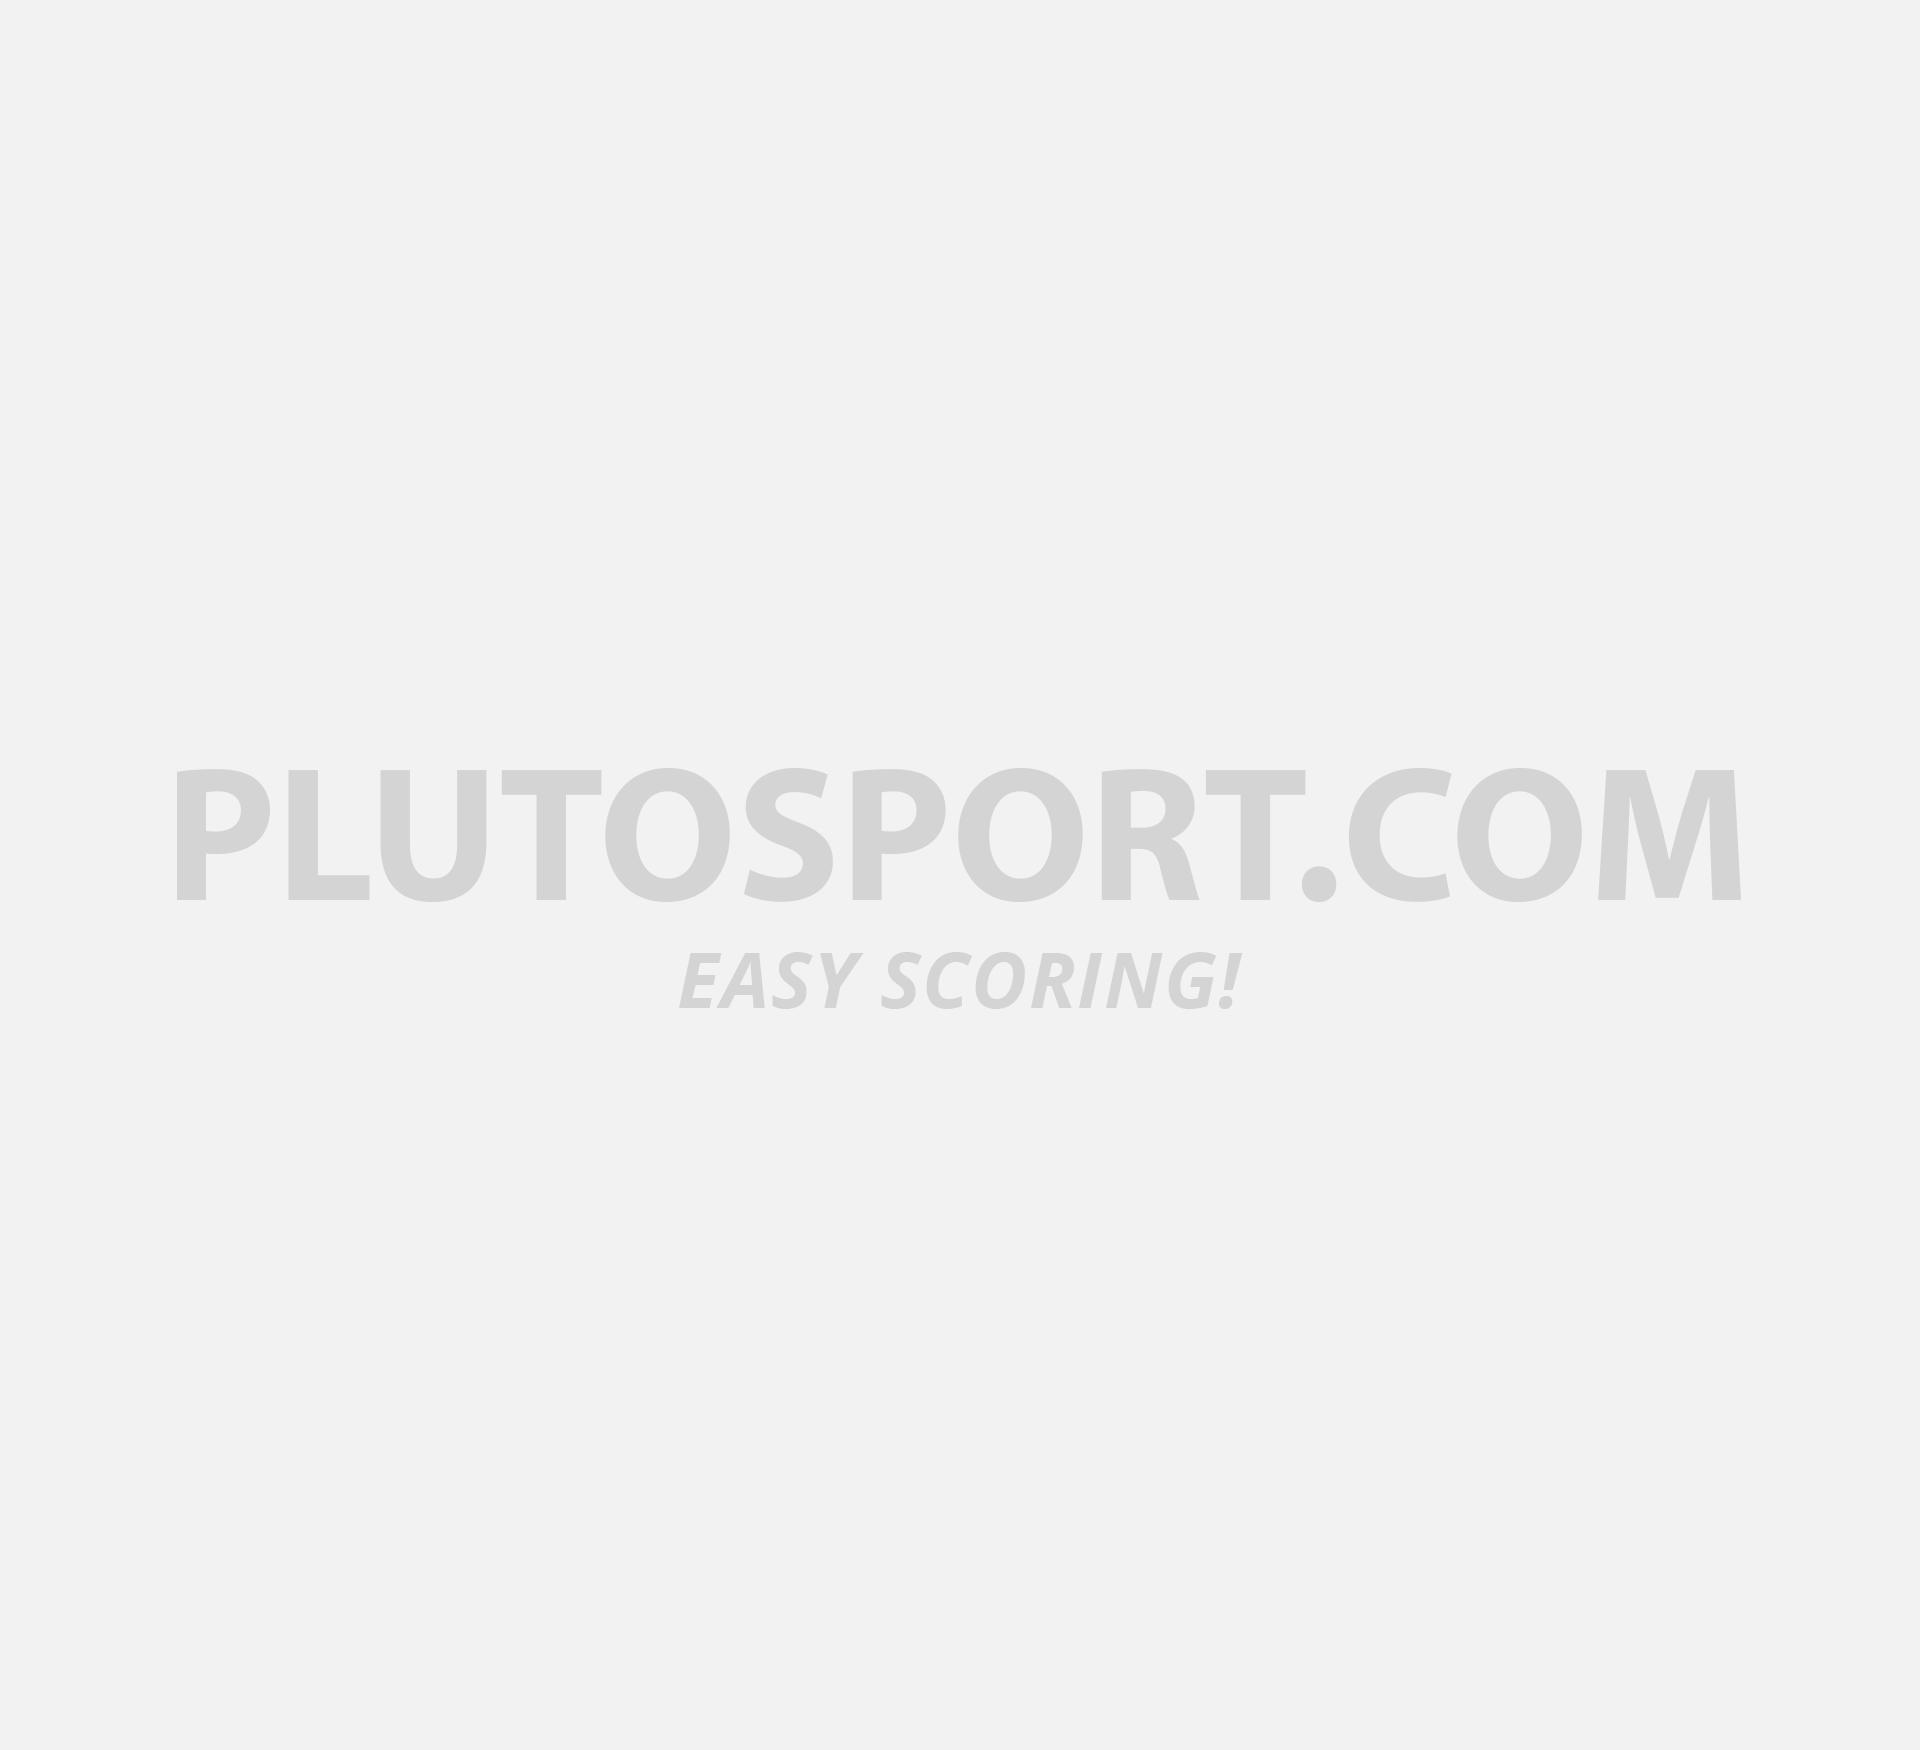 d2847fea5be Nijdam Rollerskate Jr (adjustable) - Rollerskates - Skates - Skating -  Sports   Plutosport